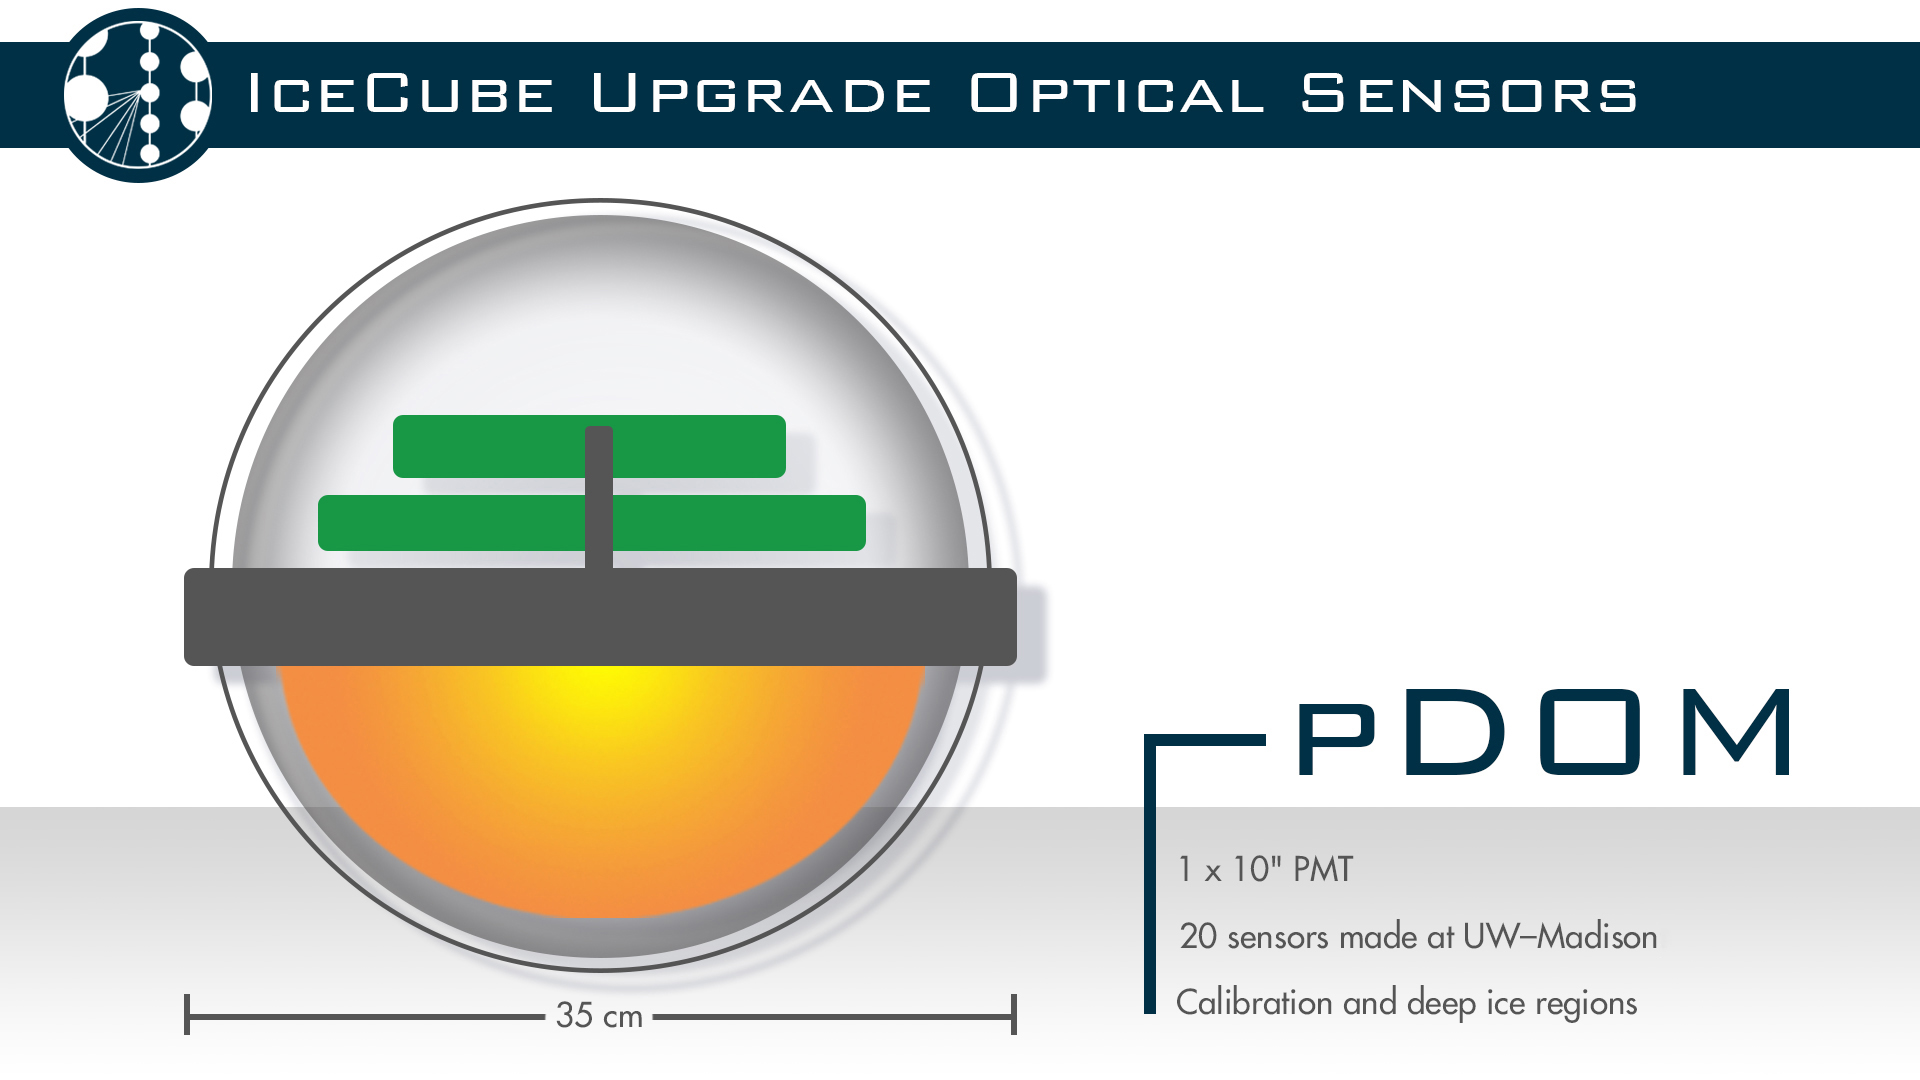 Optical sensor: pDOM